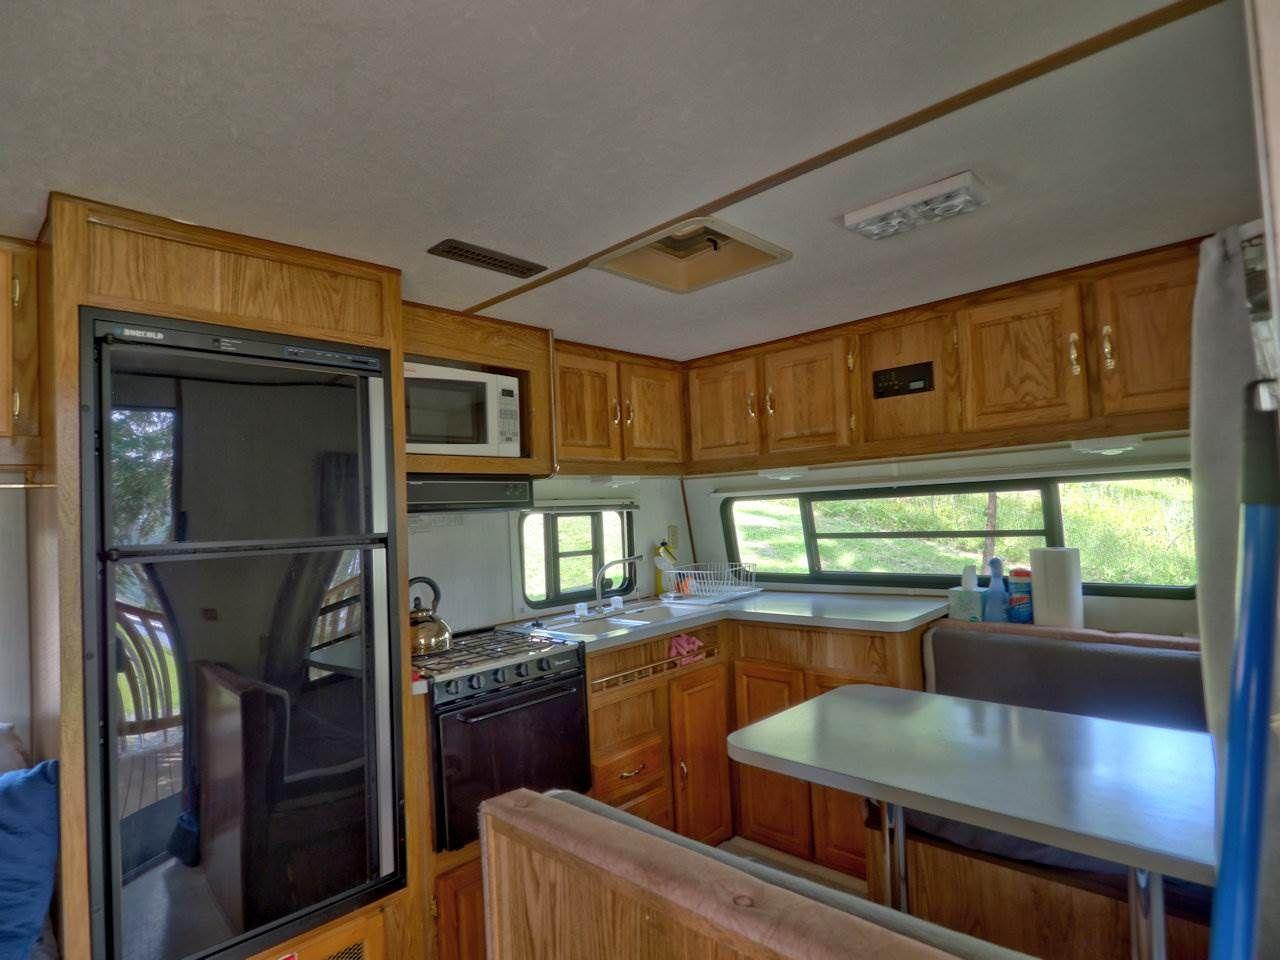 Photo 25: Photos: 7271 NATH Road in Bridge Lake: Bridge Lake/Sheridan Lake Land for sale (100 Mile House (Zone 10))  : MLS®# R2496086